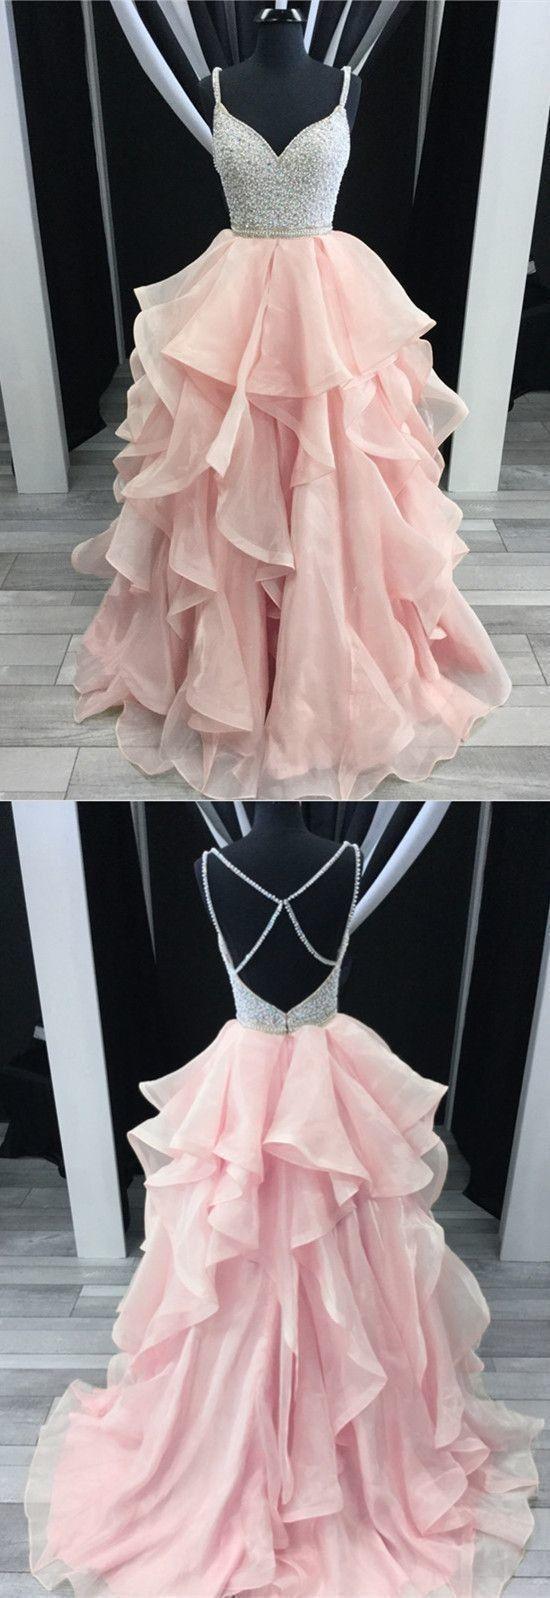 Vestidos  Pretty prom dresses, Prom dresses for teens, Cute prom